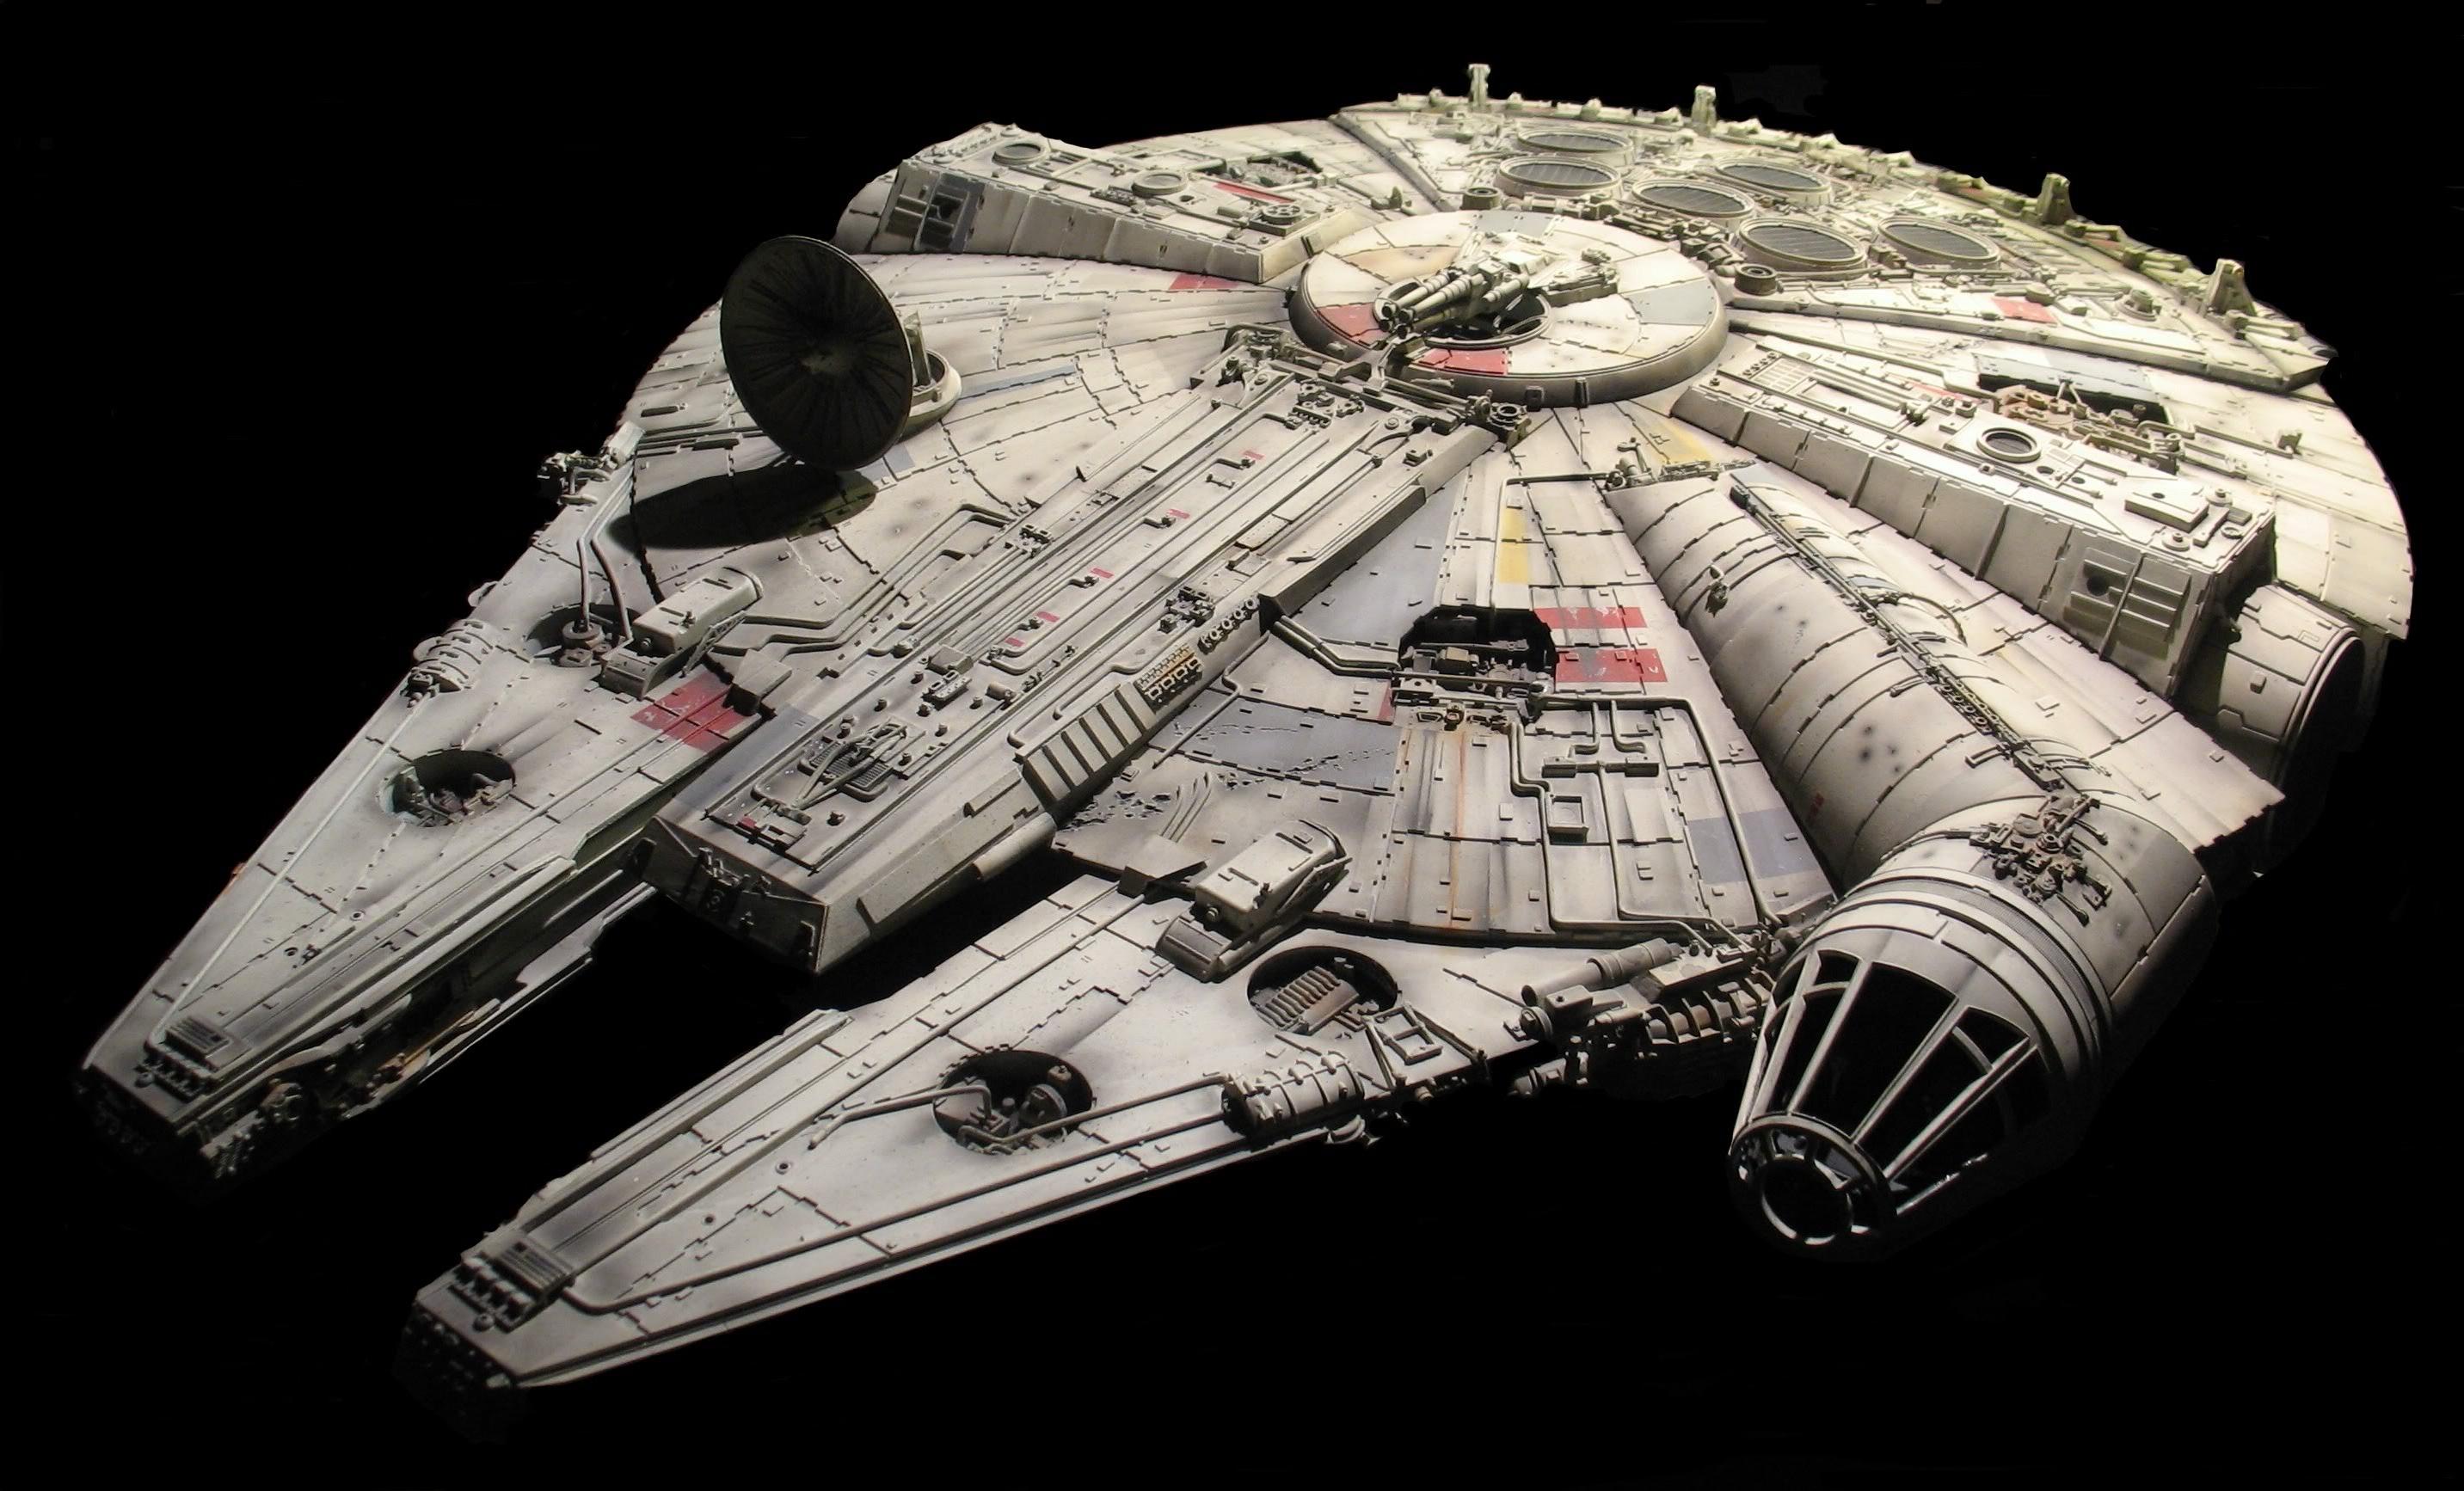 Star Wars Millennium Falcon Wallpapers Hd Desktop And Mobile Star Wars Wallpaper Star Wars Ships Star Wars Spaceships